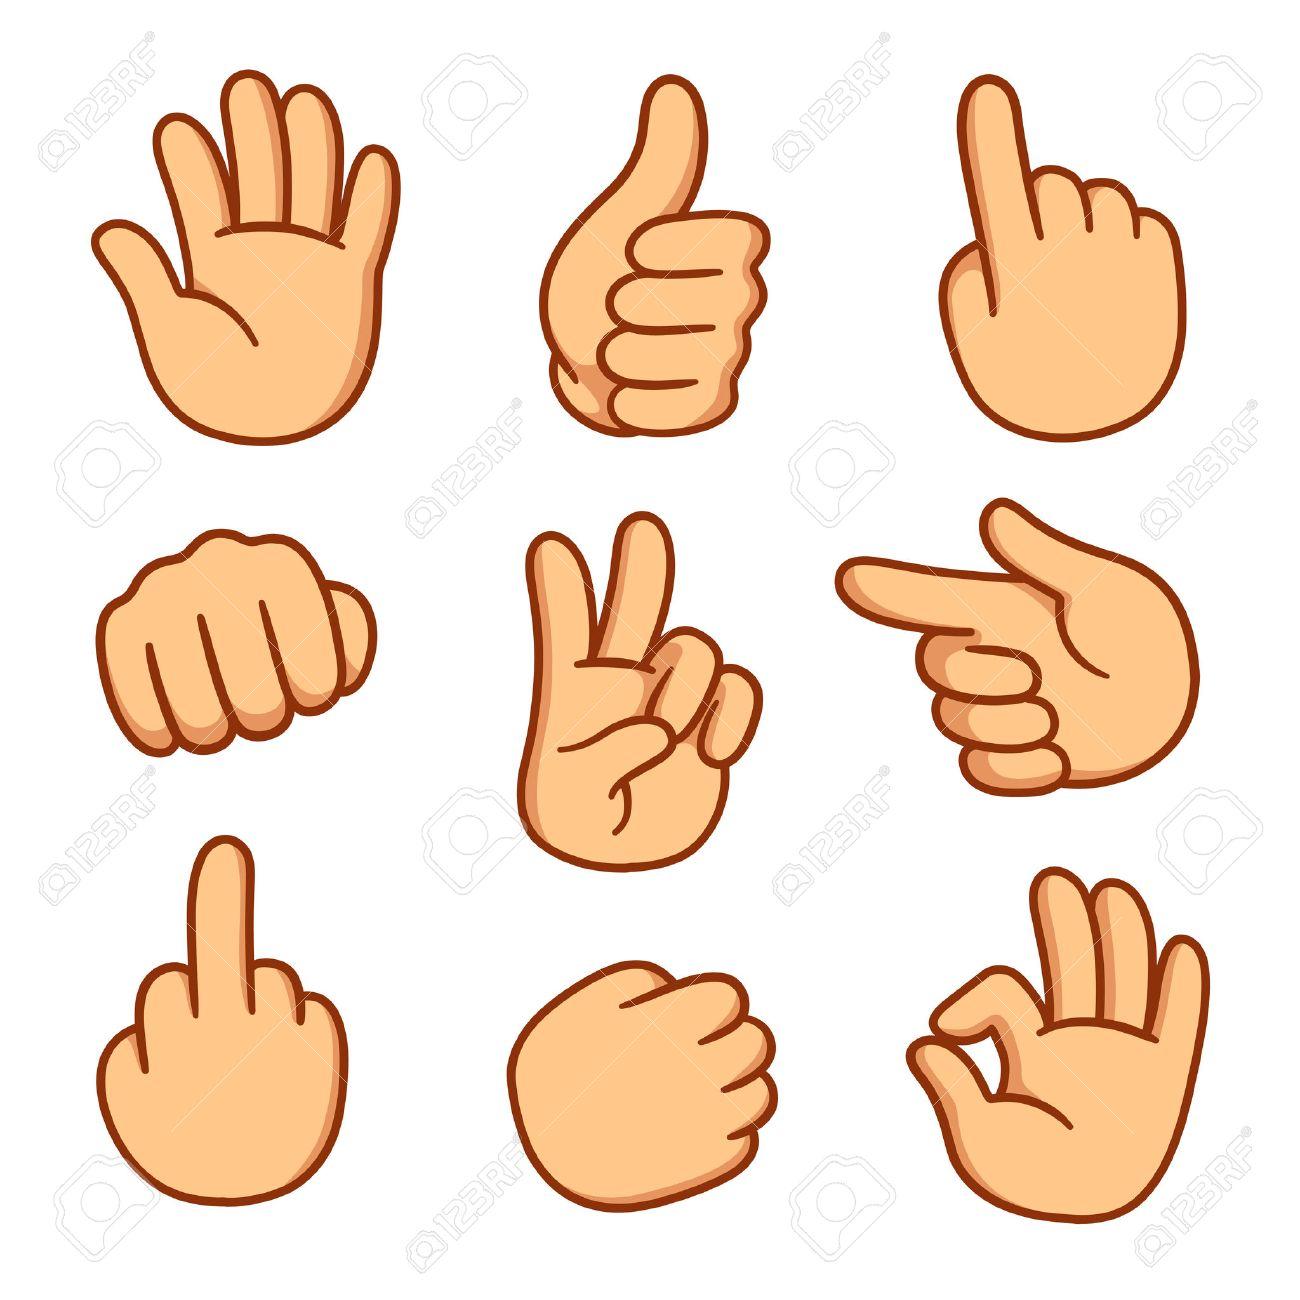 Cartoon Hands Set Different Gestures Vector Illustration Royalty